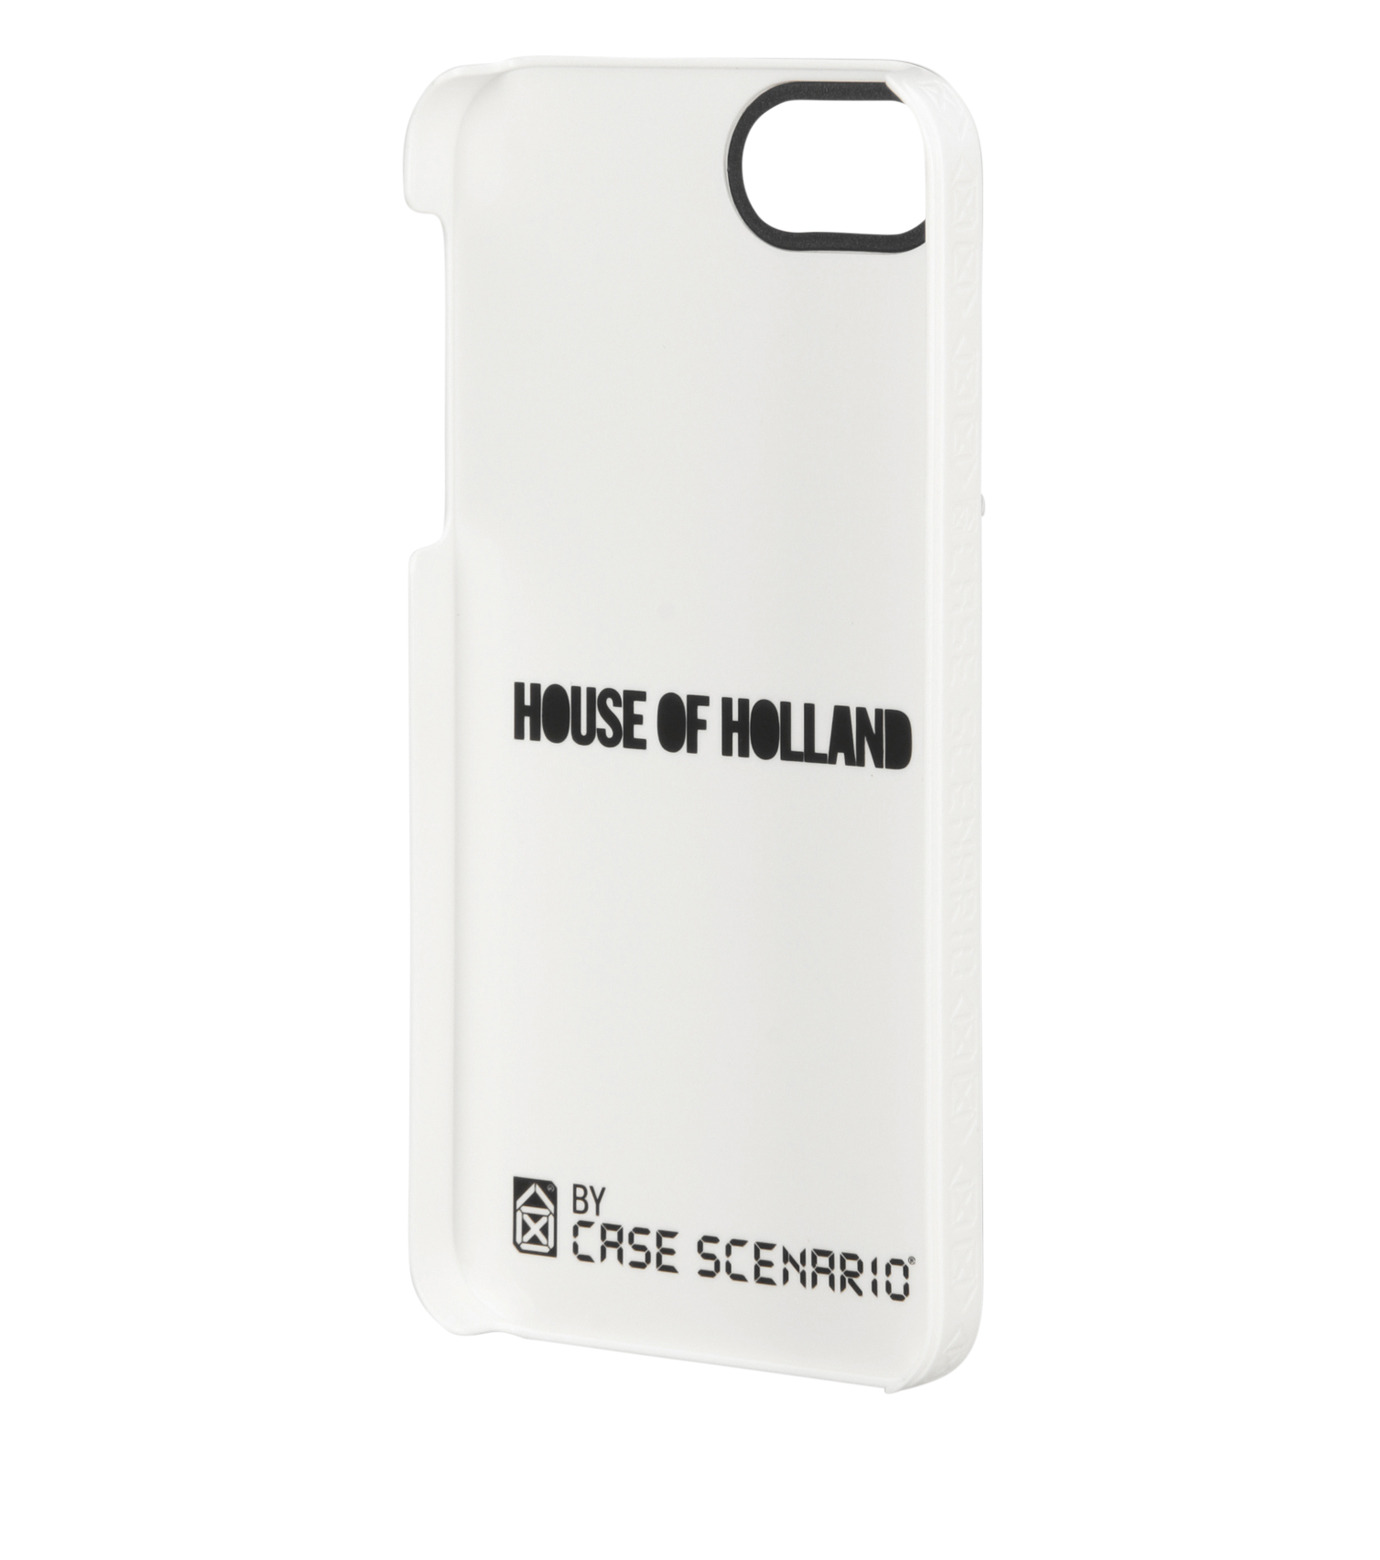 CASE SCENARIO(ケースシナリオ)のHouse of holland-BLUE(ケースiphone5/5s/se/case iphone5/5s/se)-HH-IPH5-FL-92 拡大詳細画像2